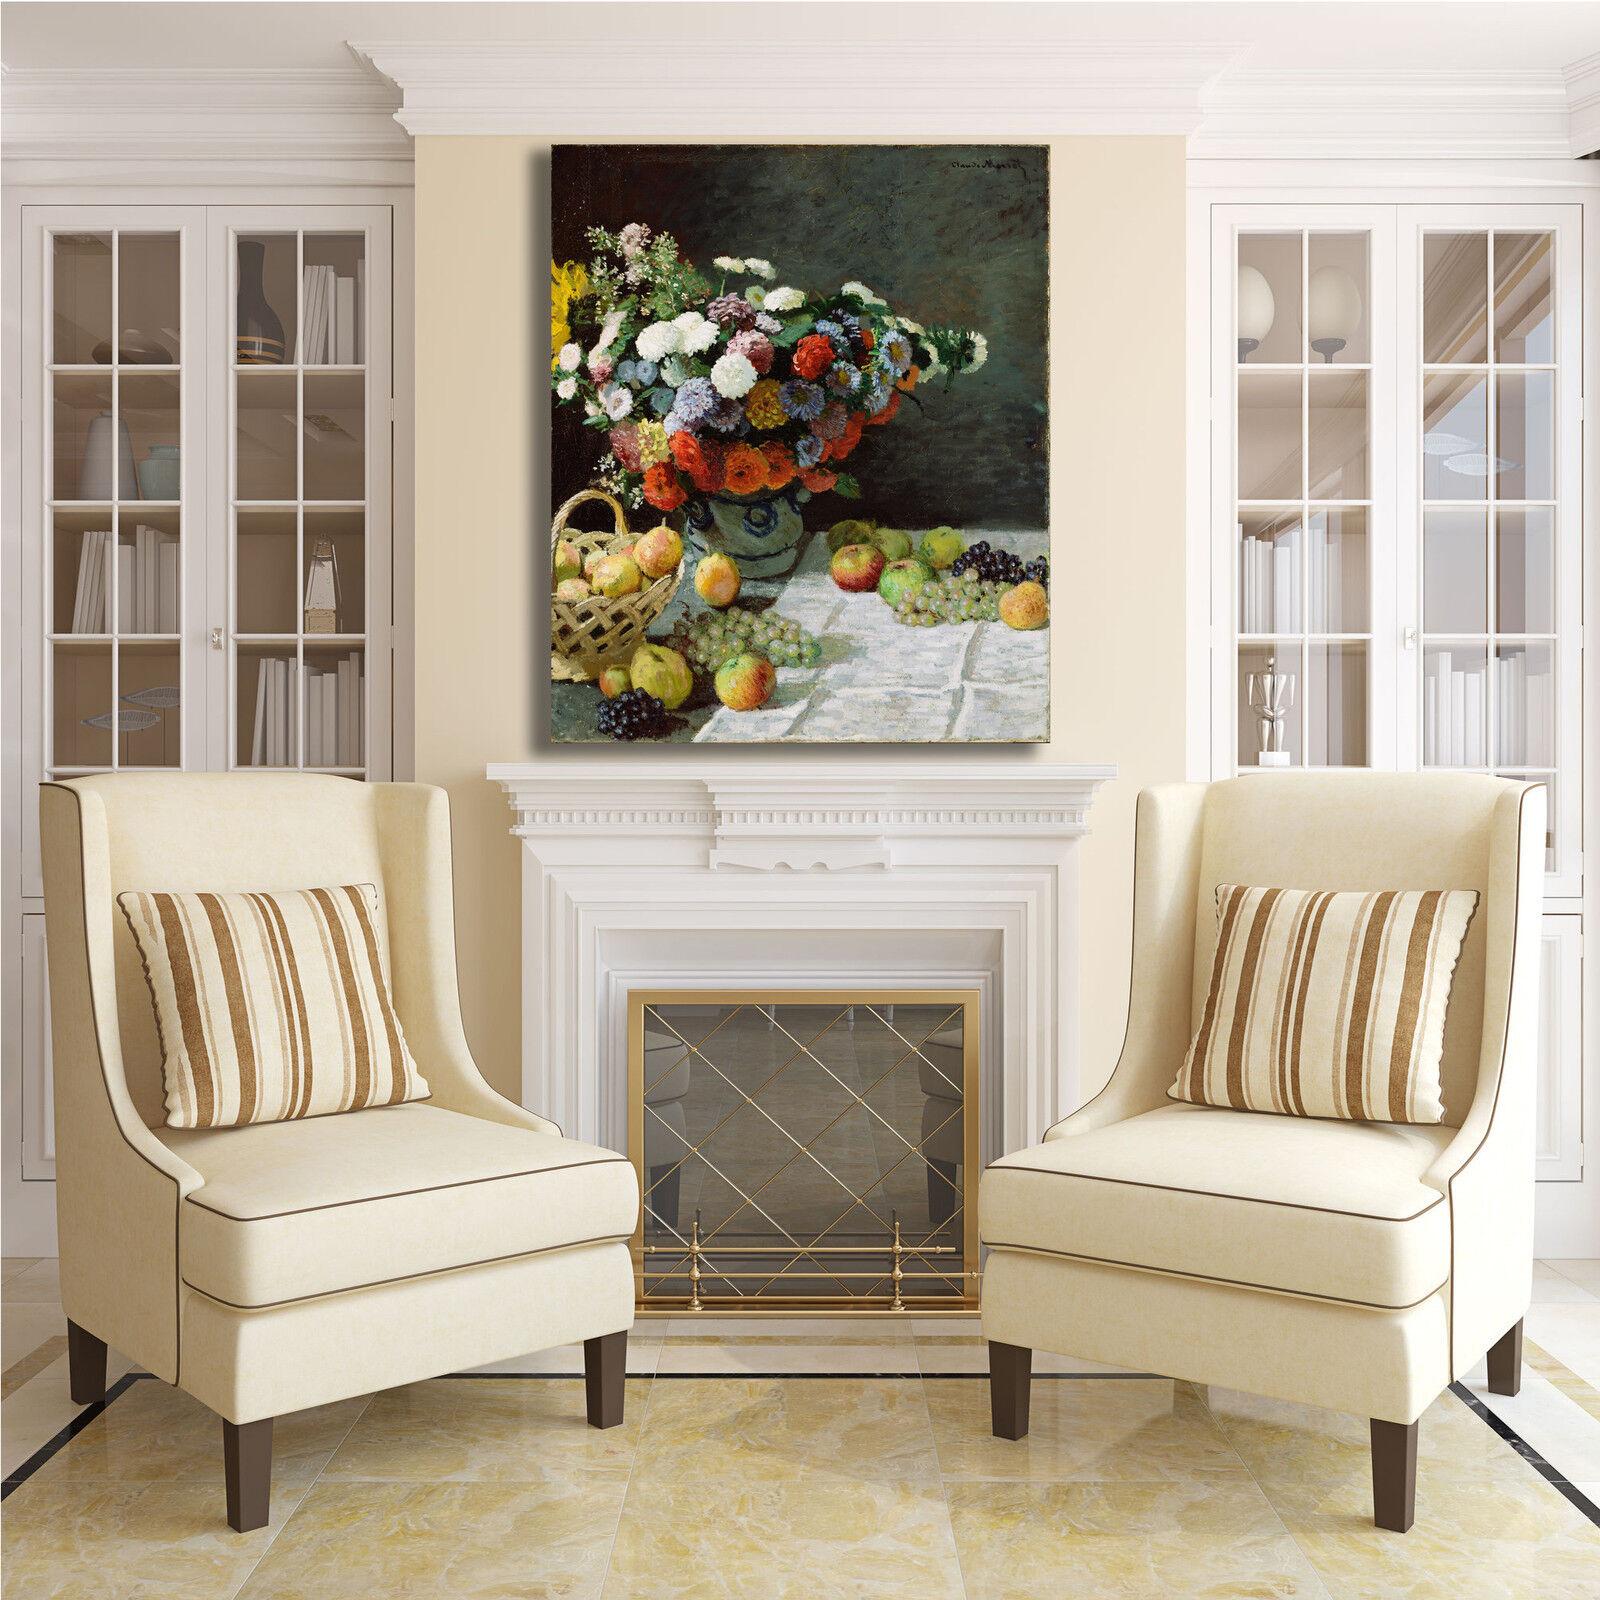 Monet natura tela morta fiori frutta quadro stampa tela natura dipinto telaio arRouge o casa f1d634